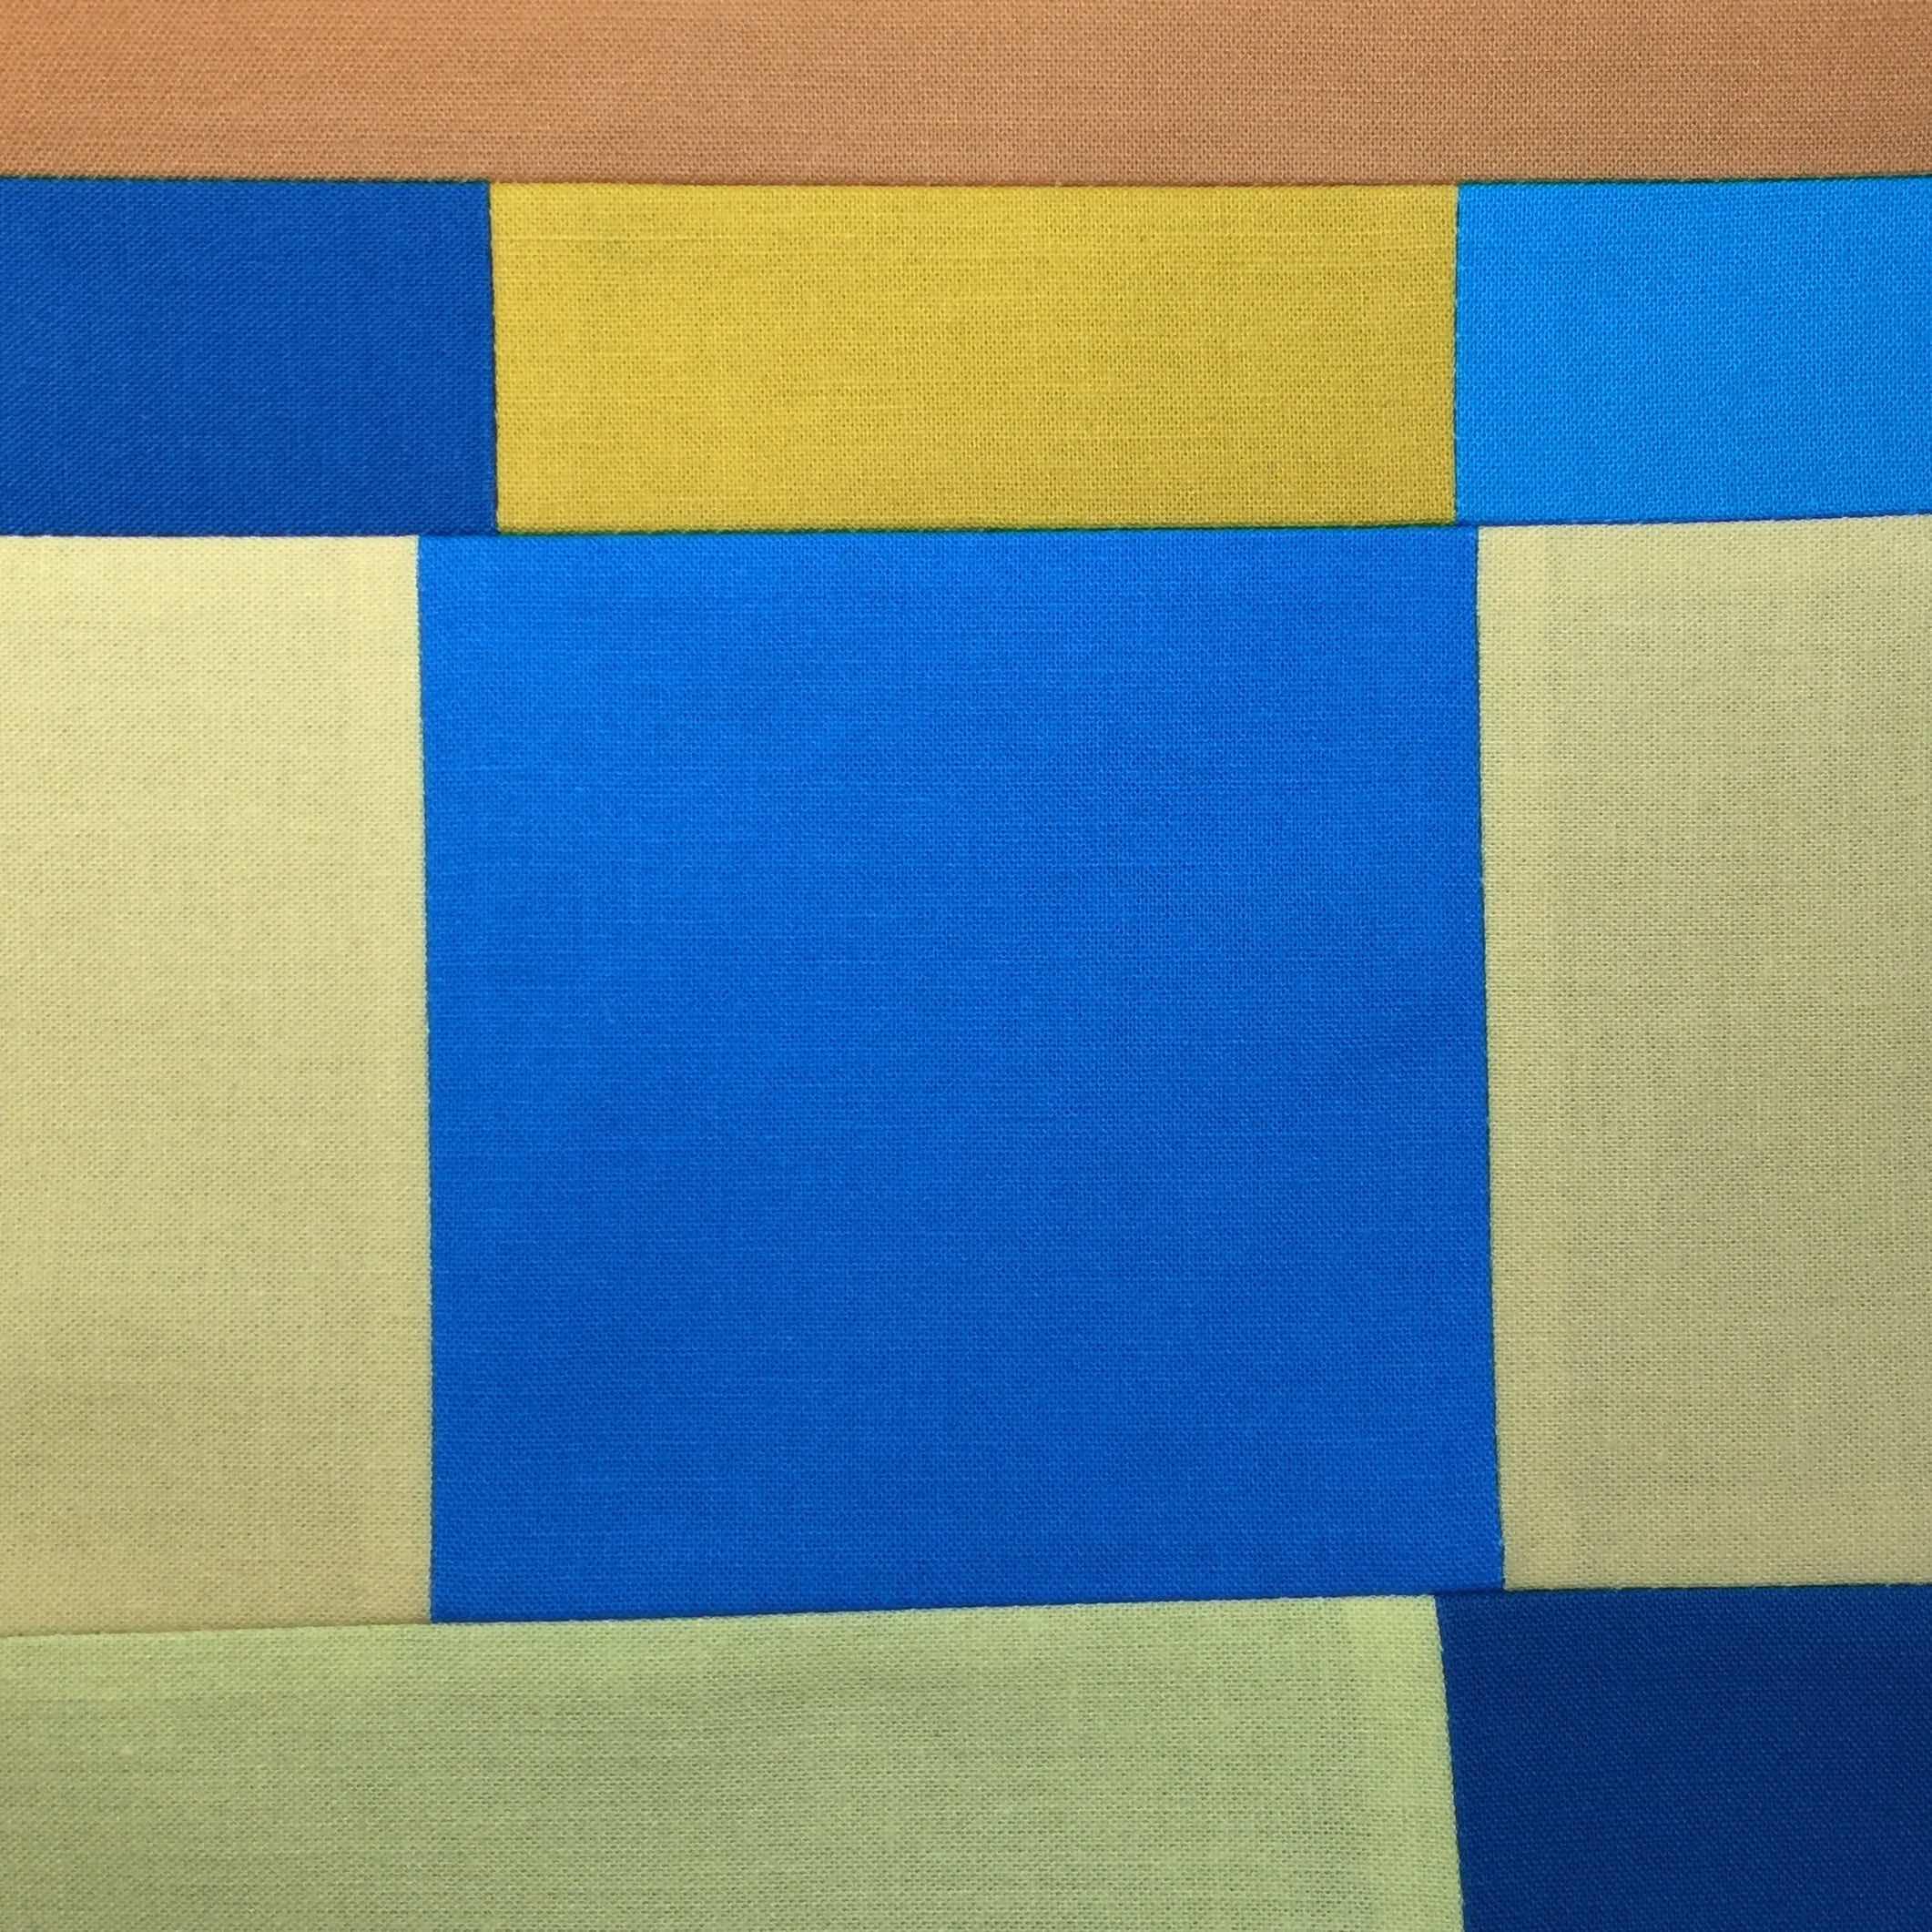 Blue Square series